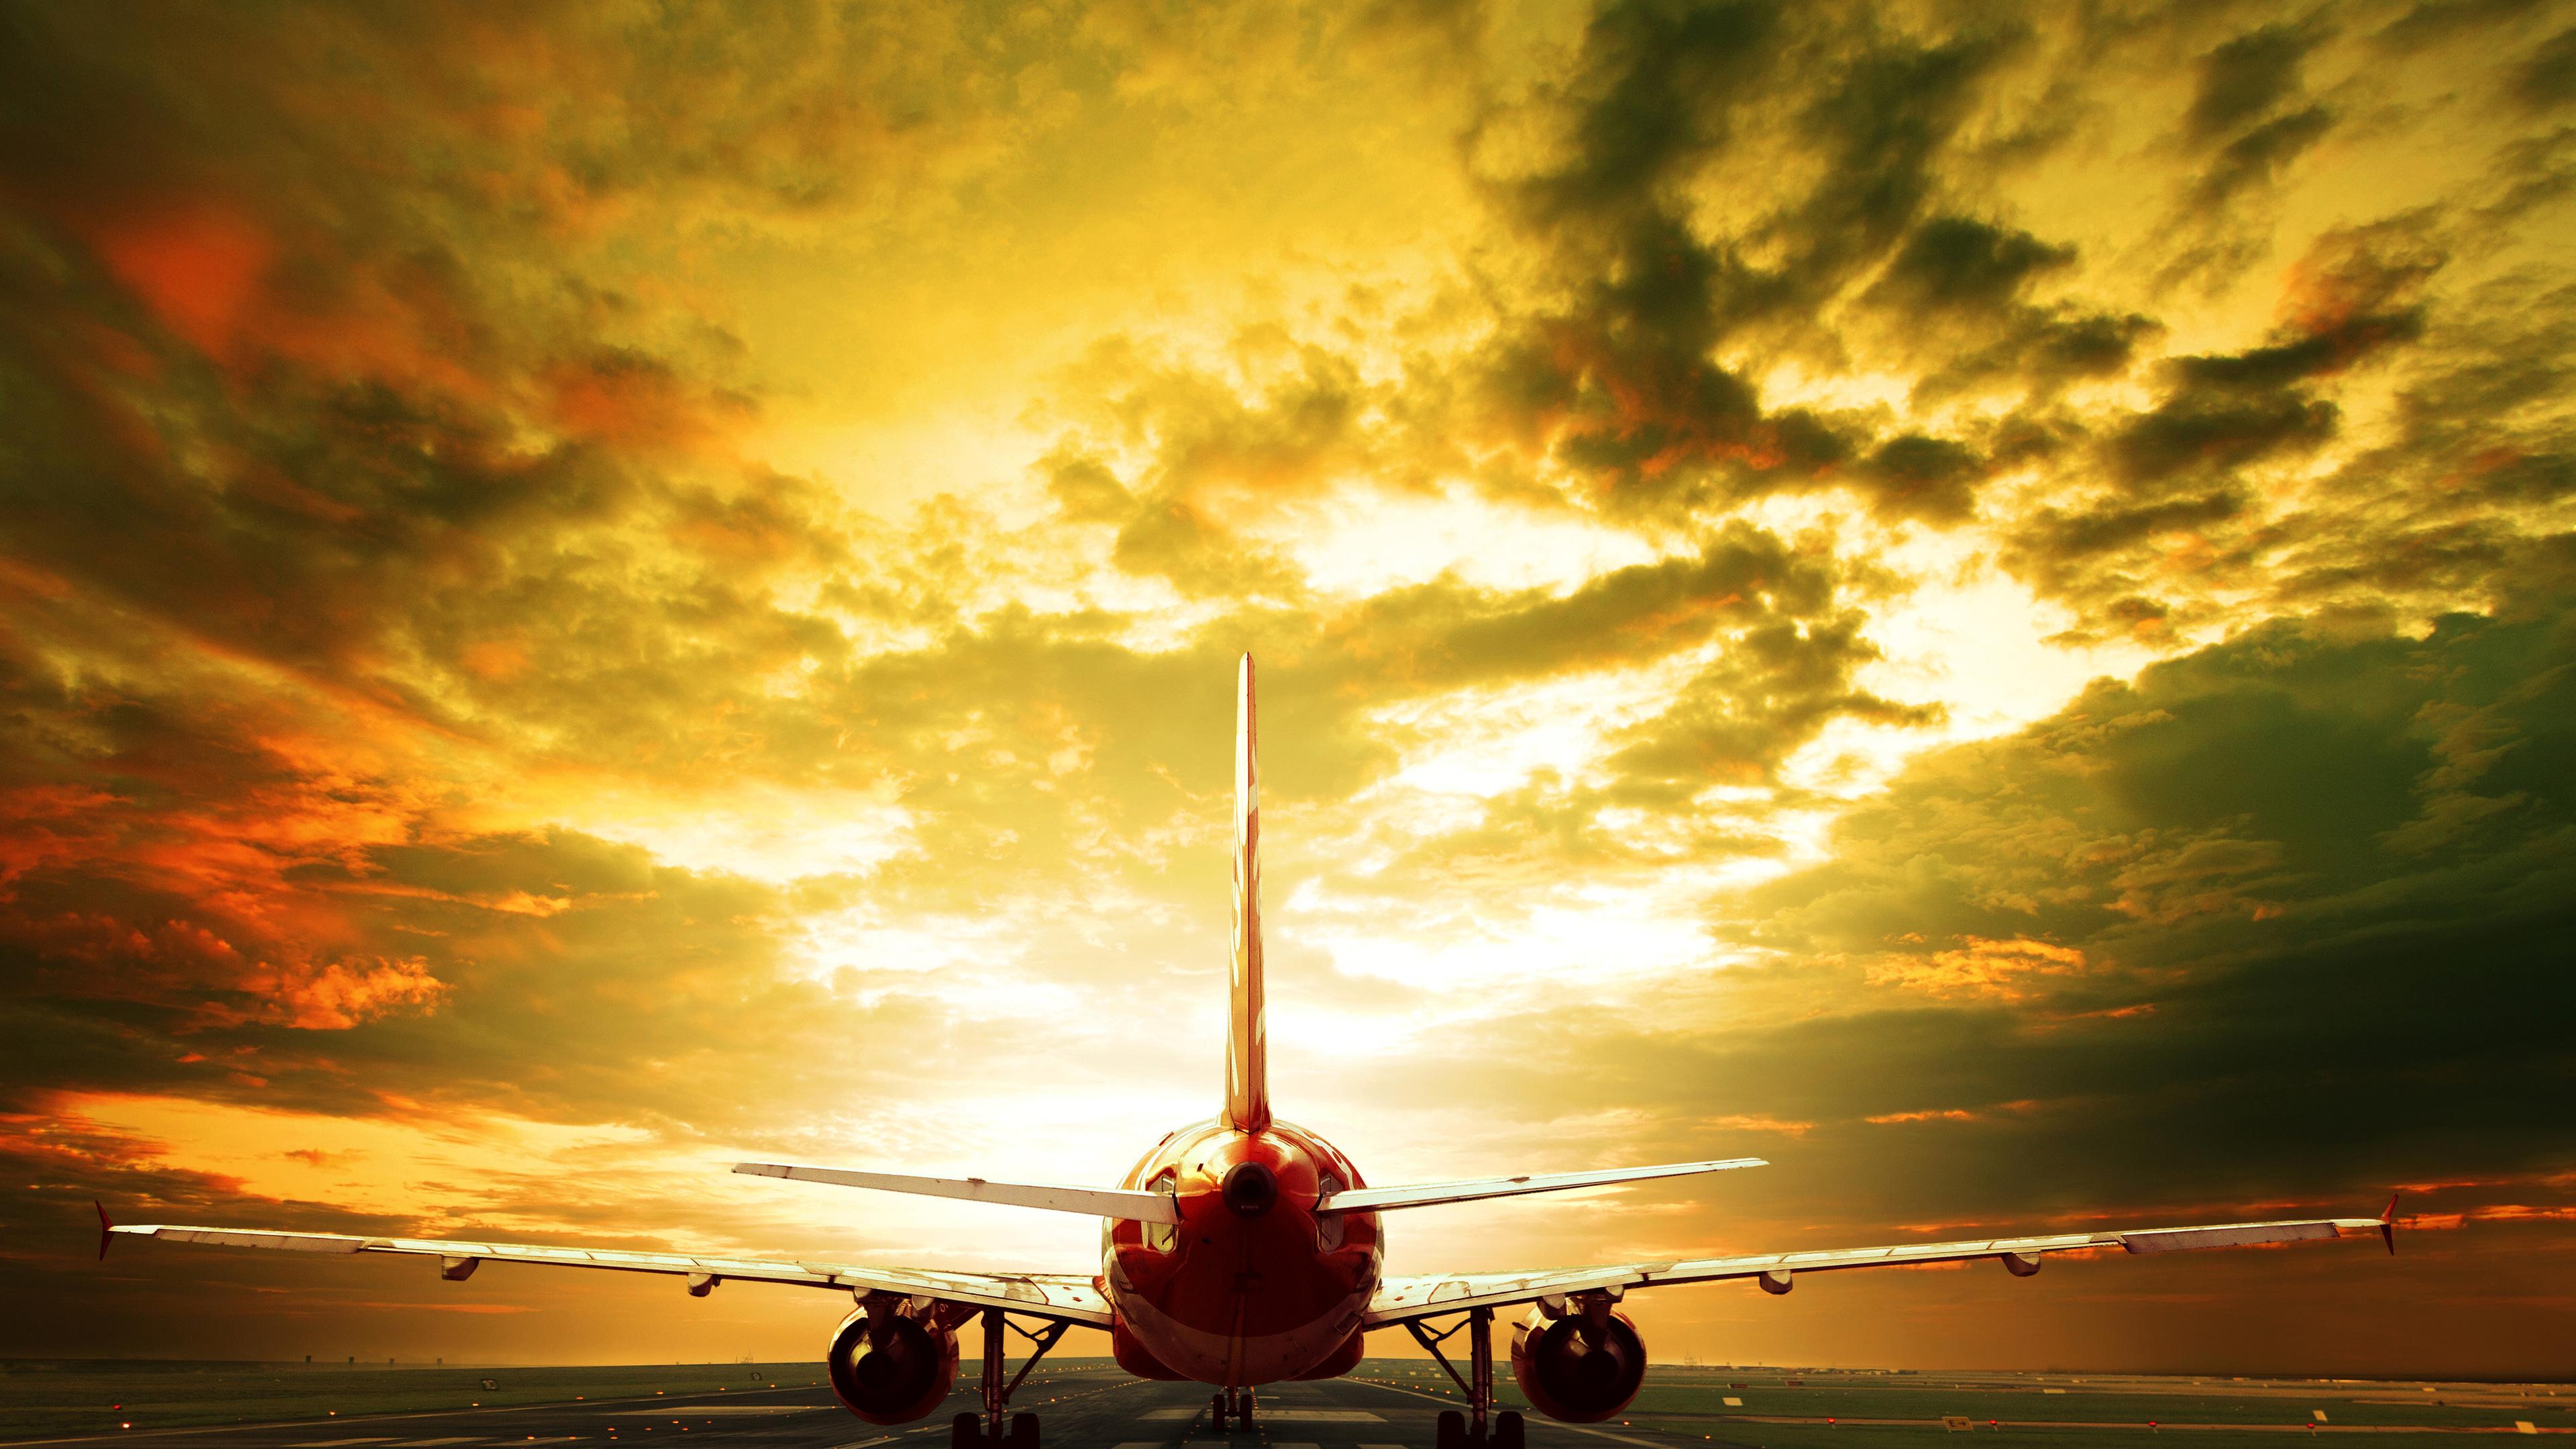 passenger airplane 4k 1547938024 - Passenger Airplane 4k - planes wallpapers, hd-wallpapers, airplane wallpapers, 4k-wallpapers